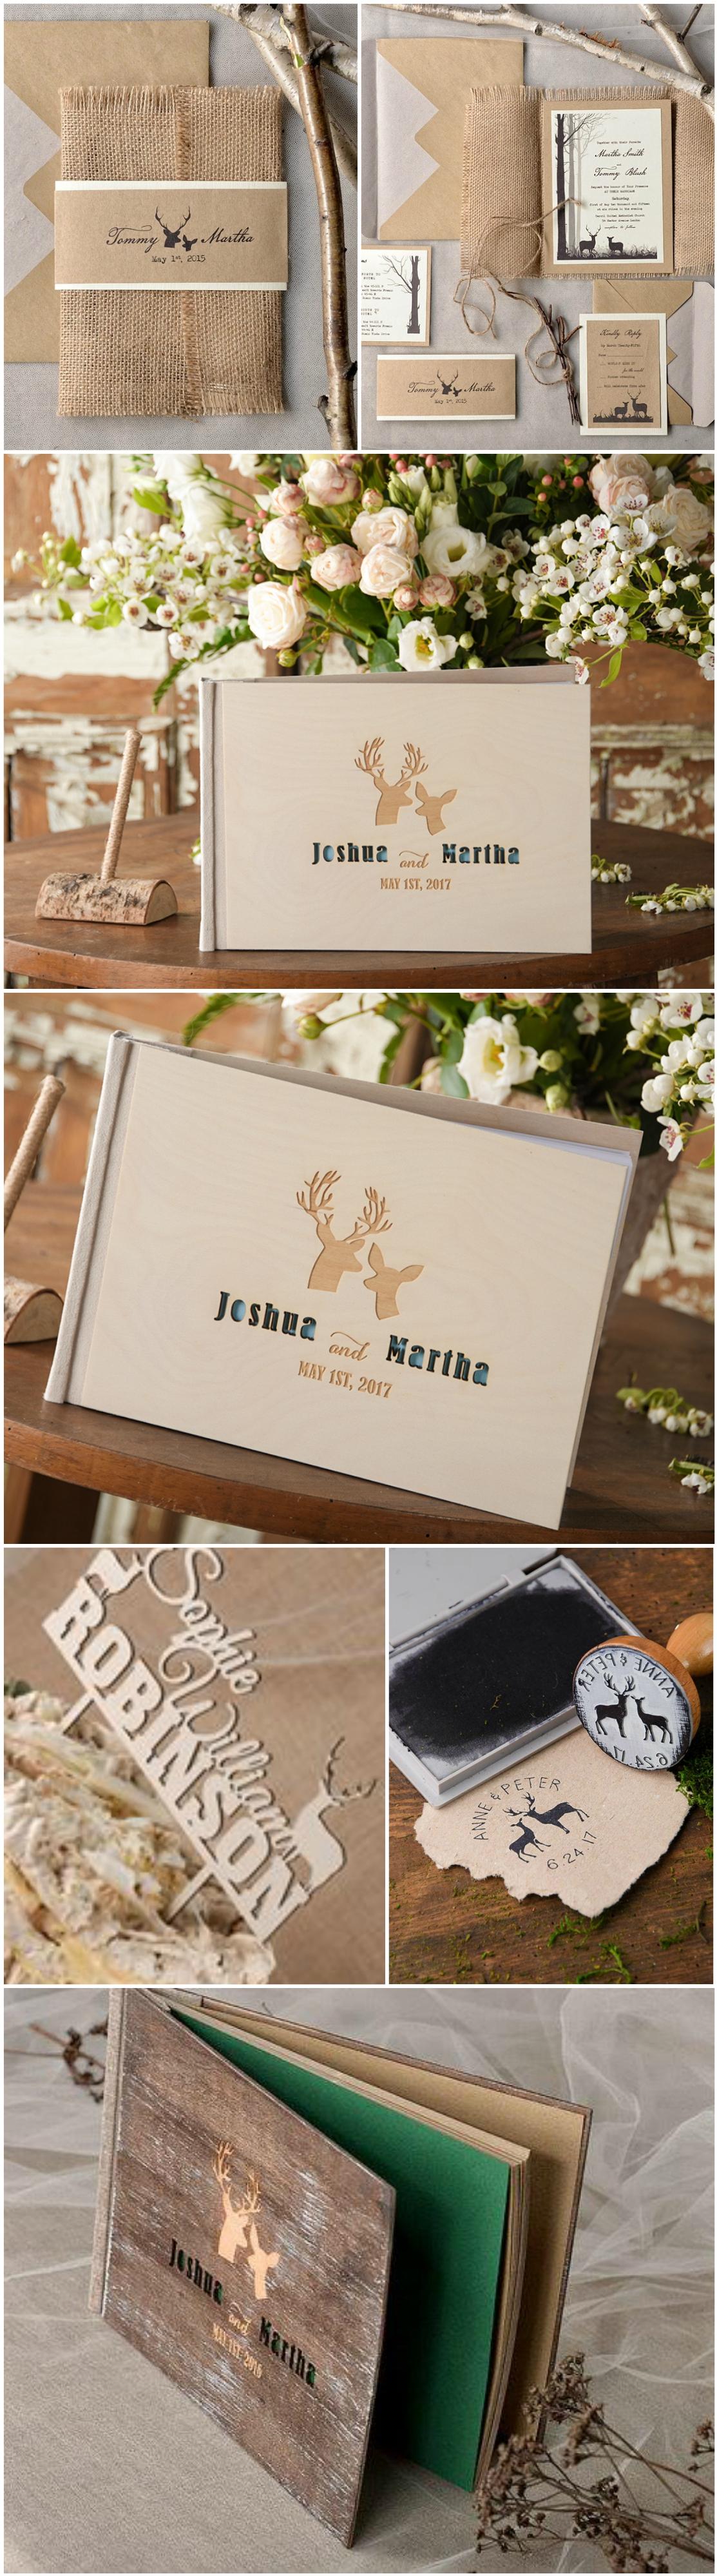 wedding invitations printed on wood%0A Handmade Wedding Invitations  Custom Made for You Rustic Wedding Invitation   Wood Wedding Invites